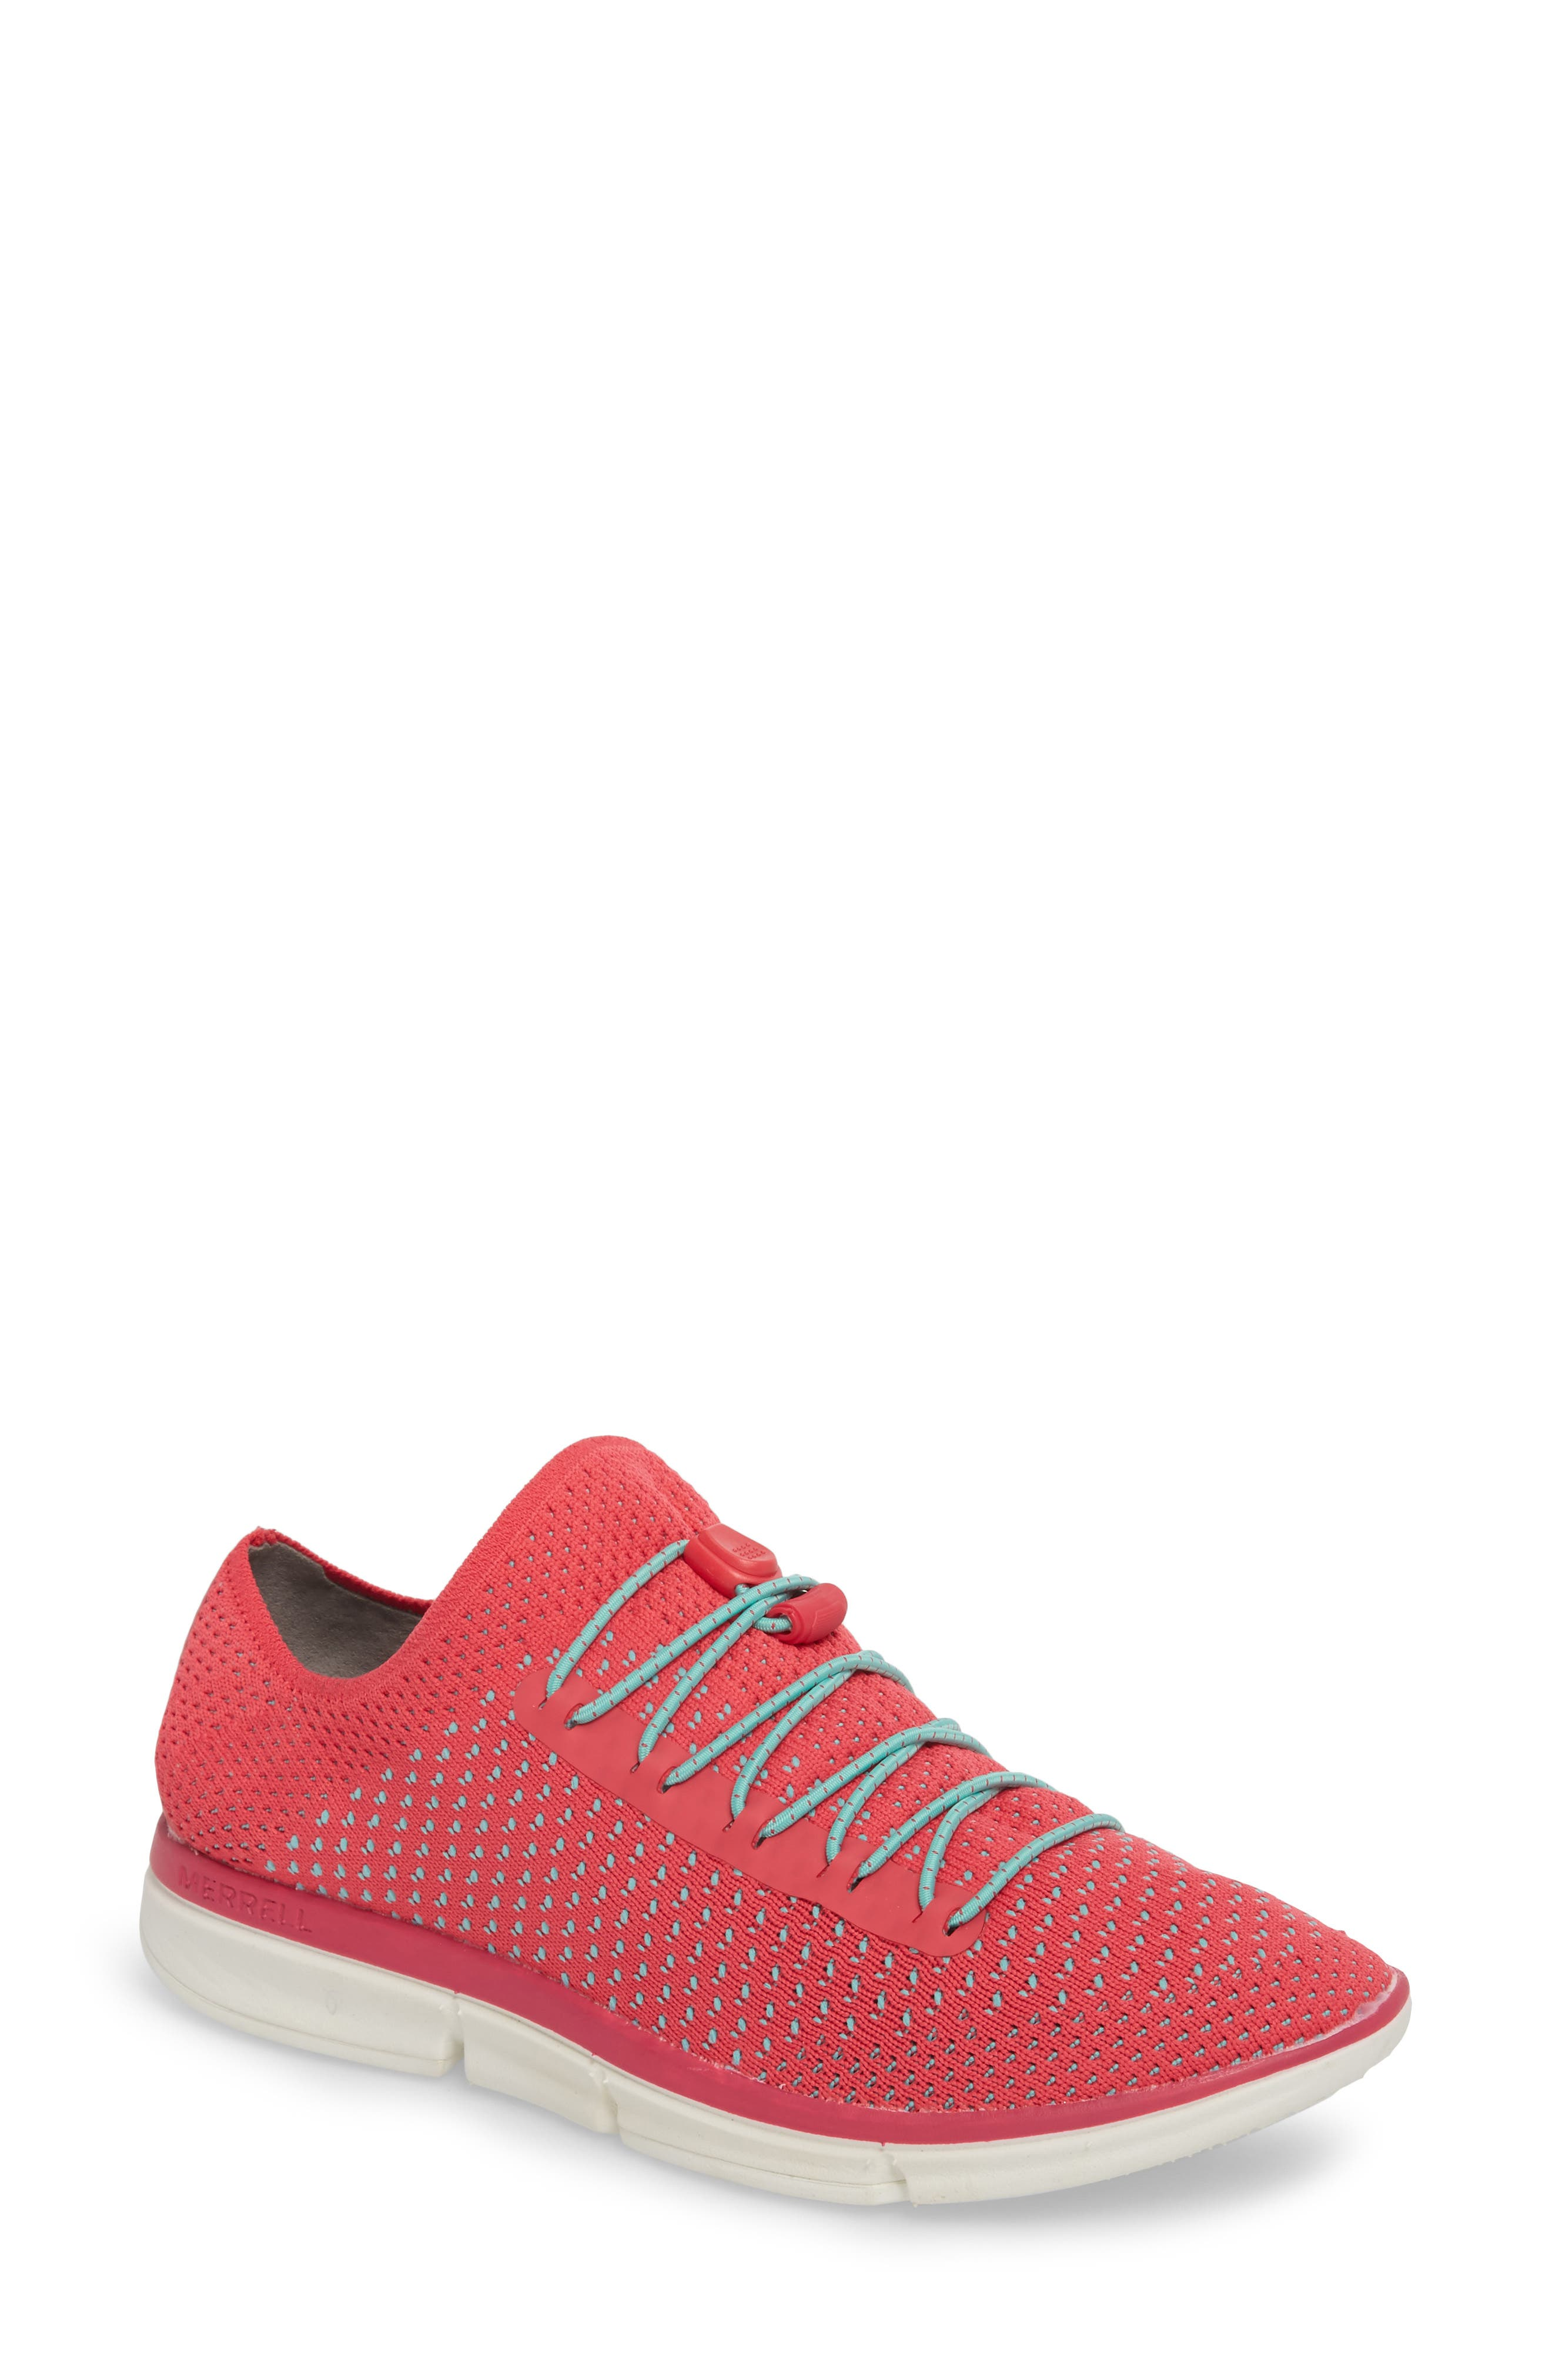 Zoe Sojourn Lace Knit Sneaker,                             Main thumbnail 1, color,                             Azalea